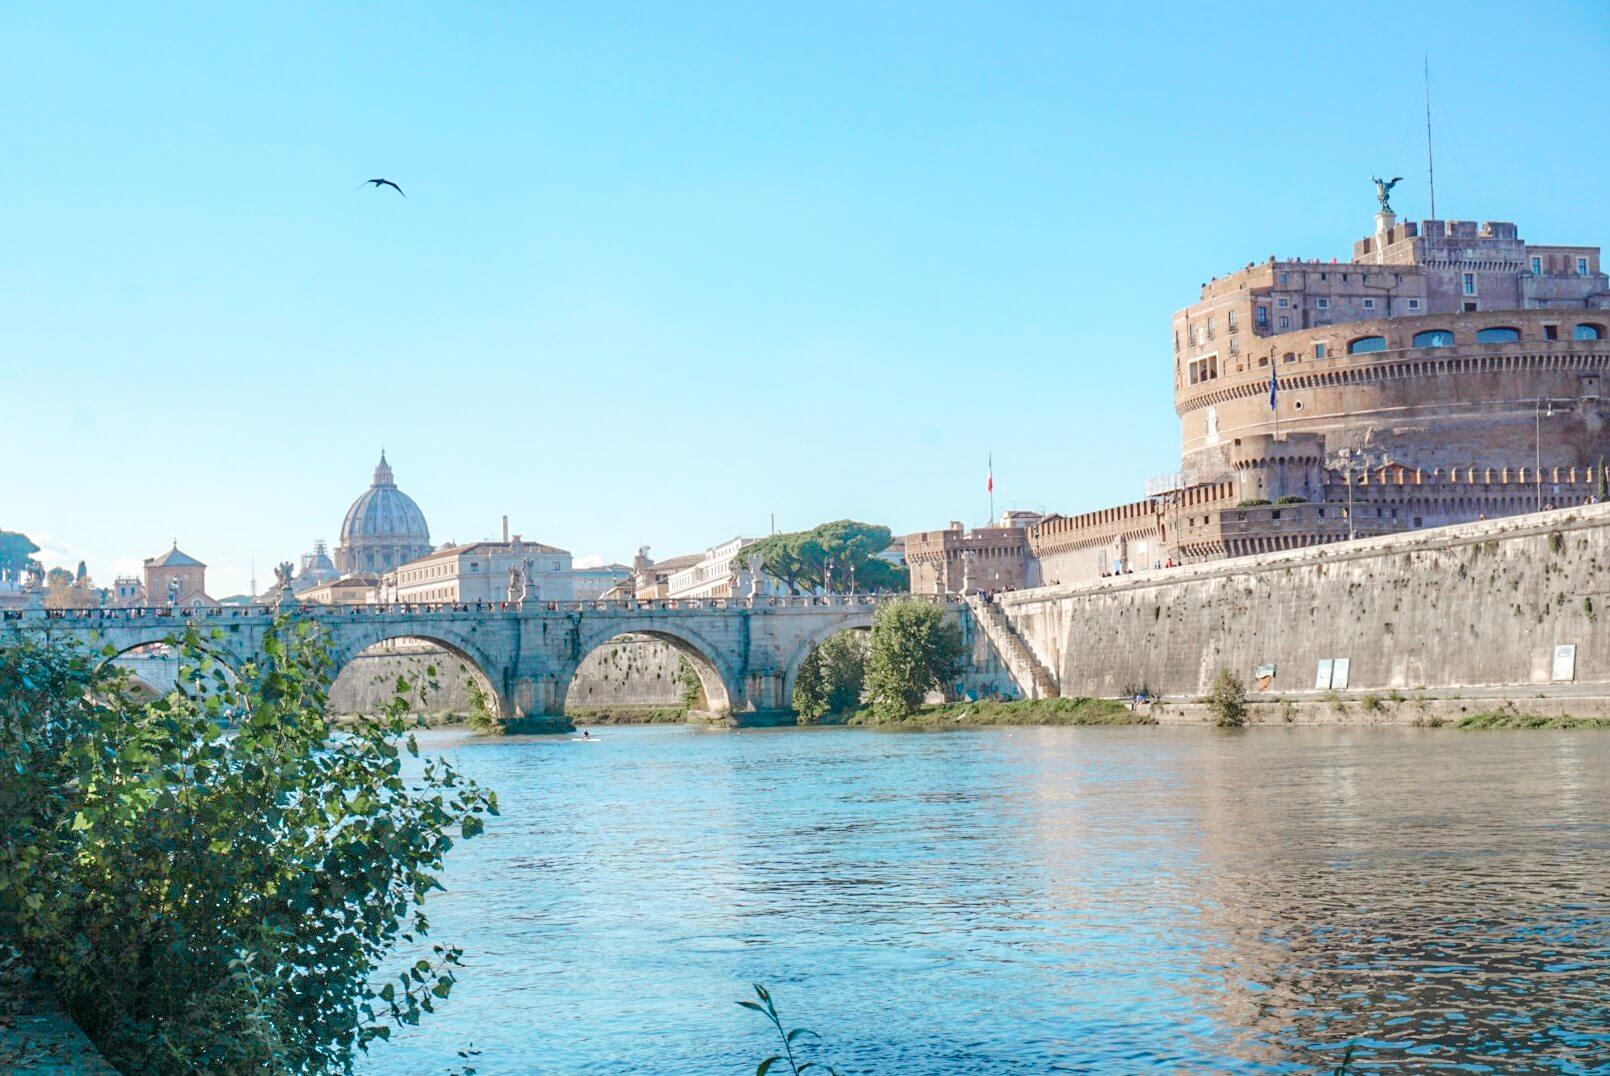 visiter chateau saint ange rome blog voyage